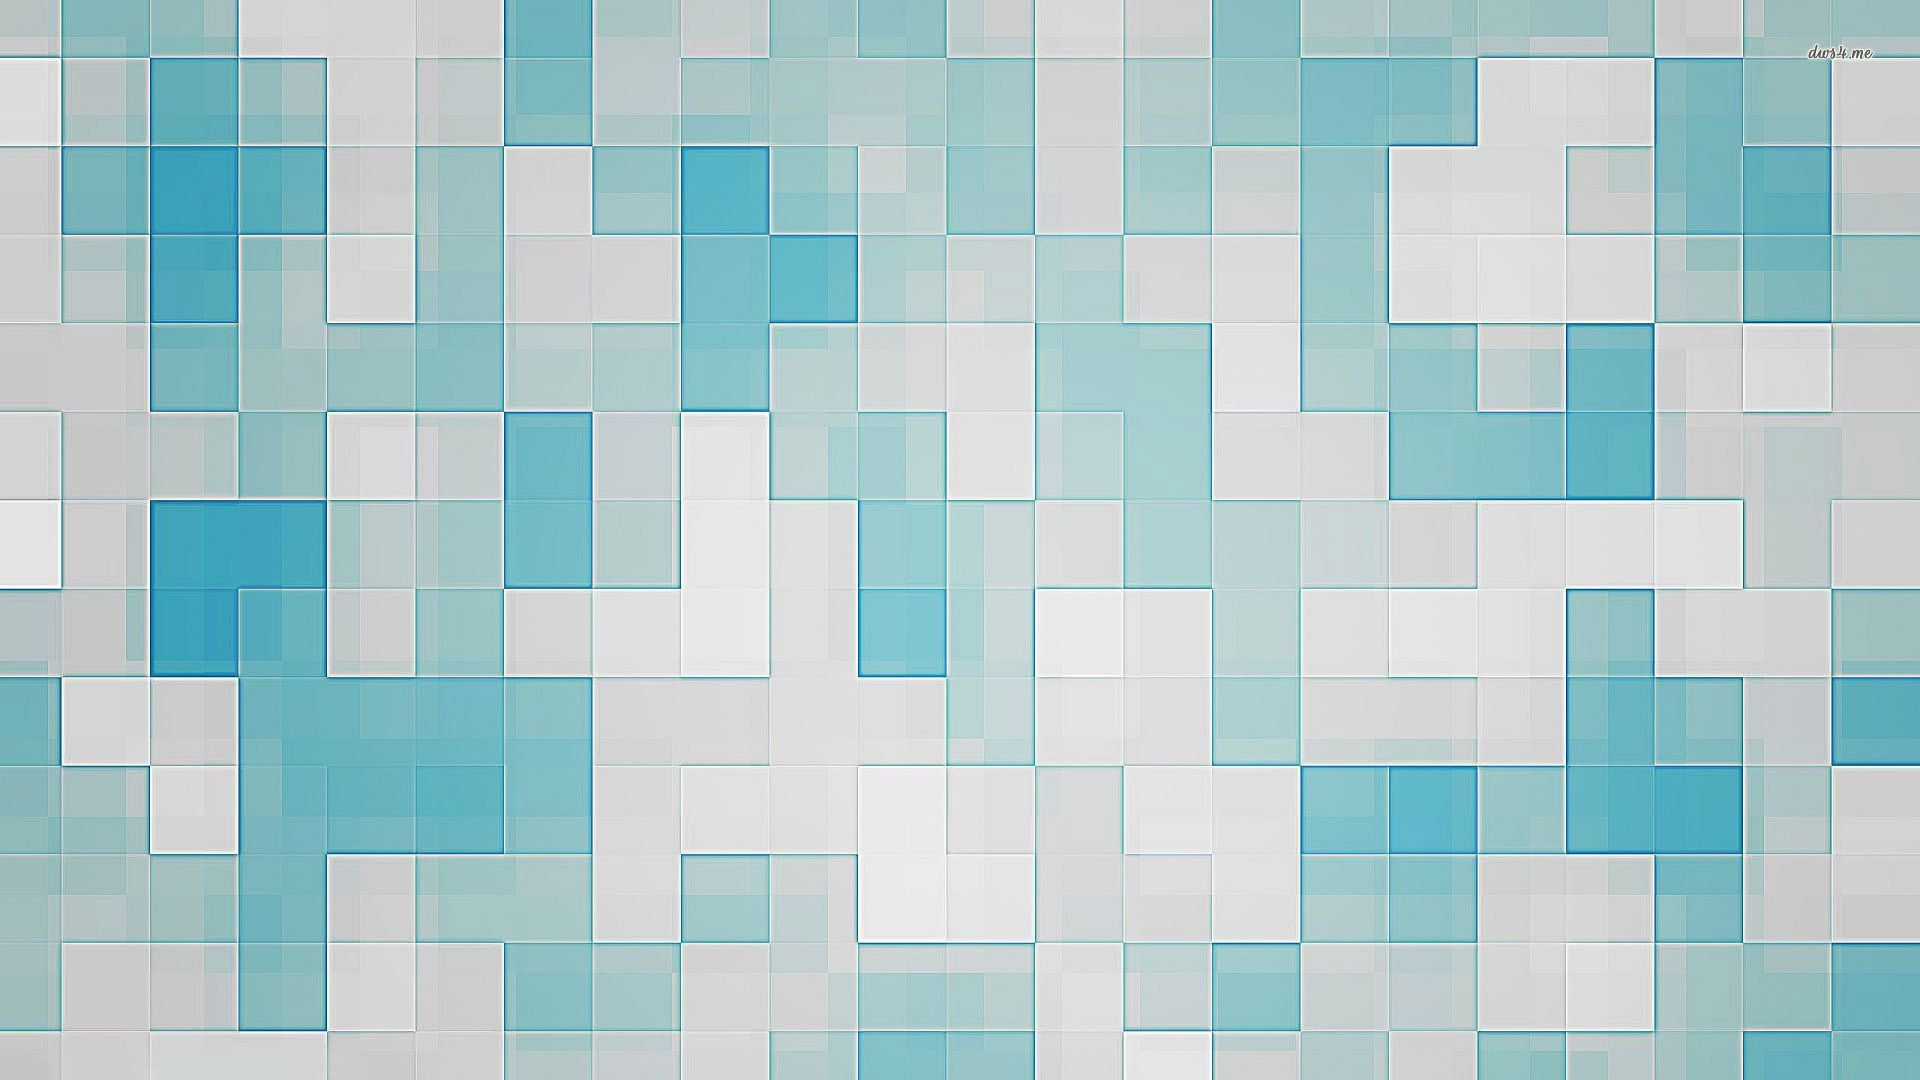 Minimalistic Pattern Square Wallpaper